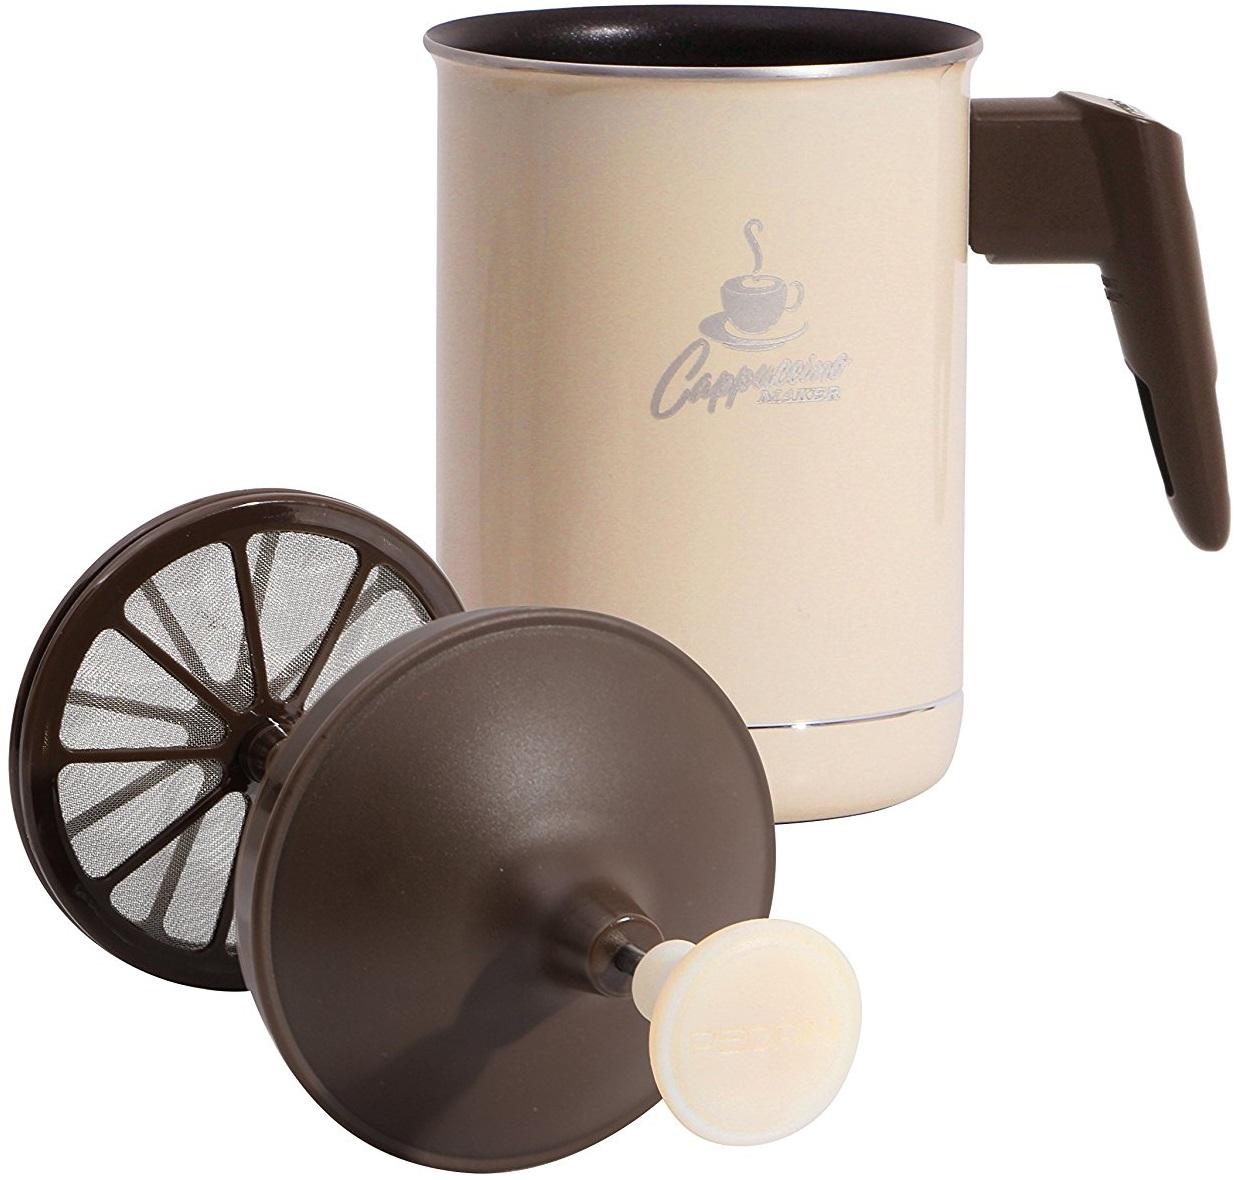 Pedrini - Pedrini Acc. Caffe Süt Köpürtücü